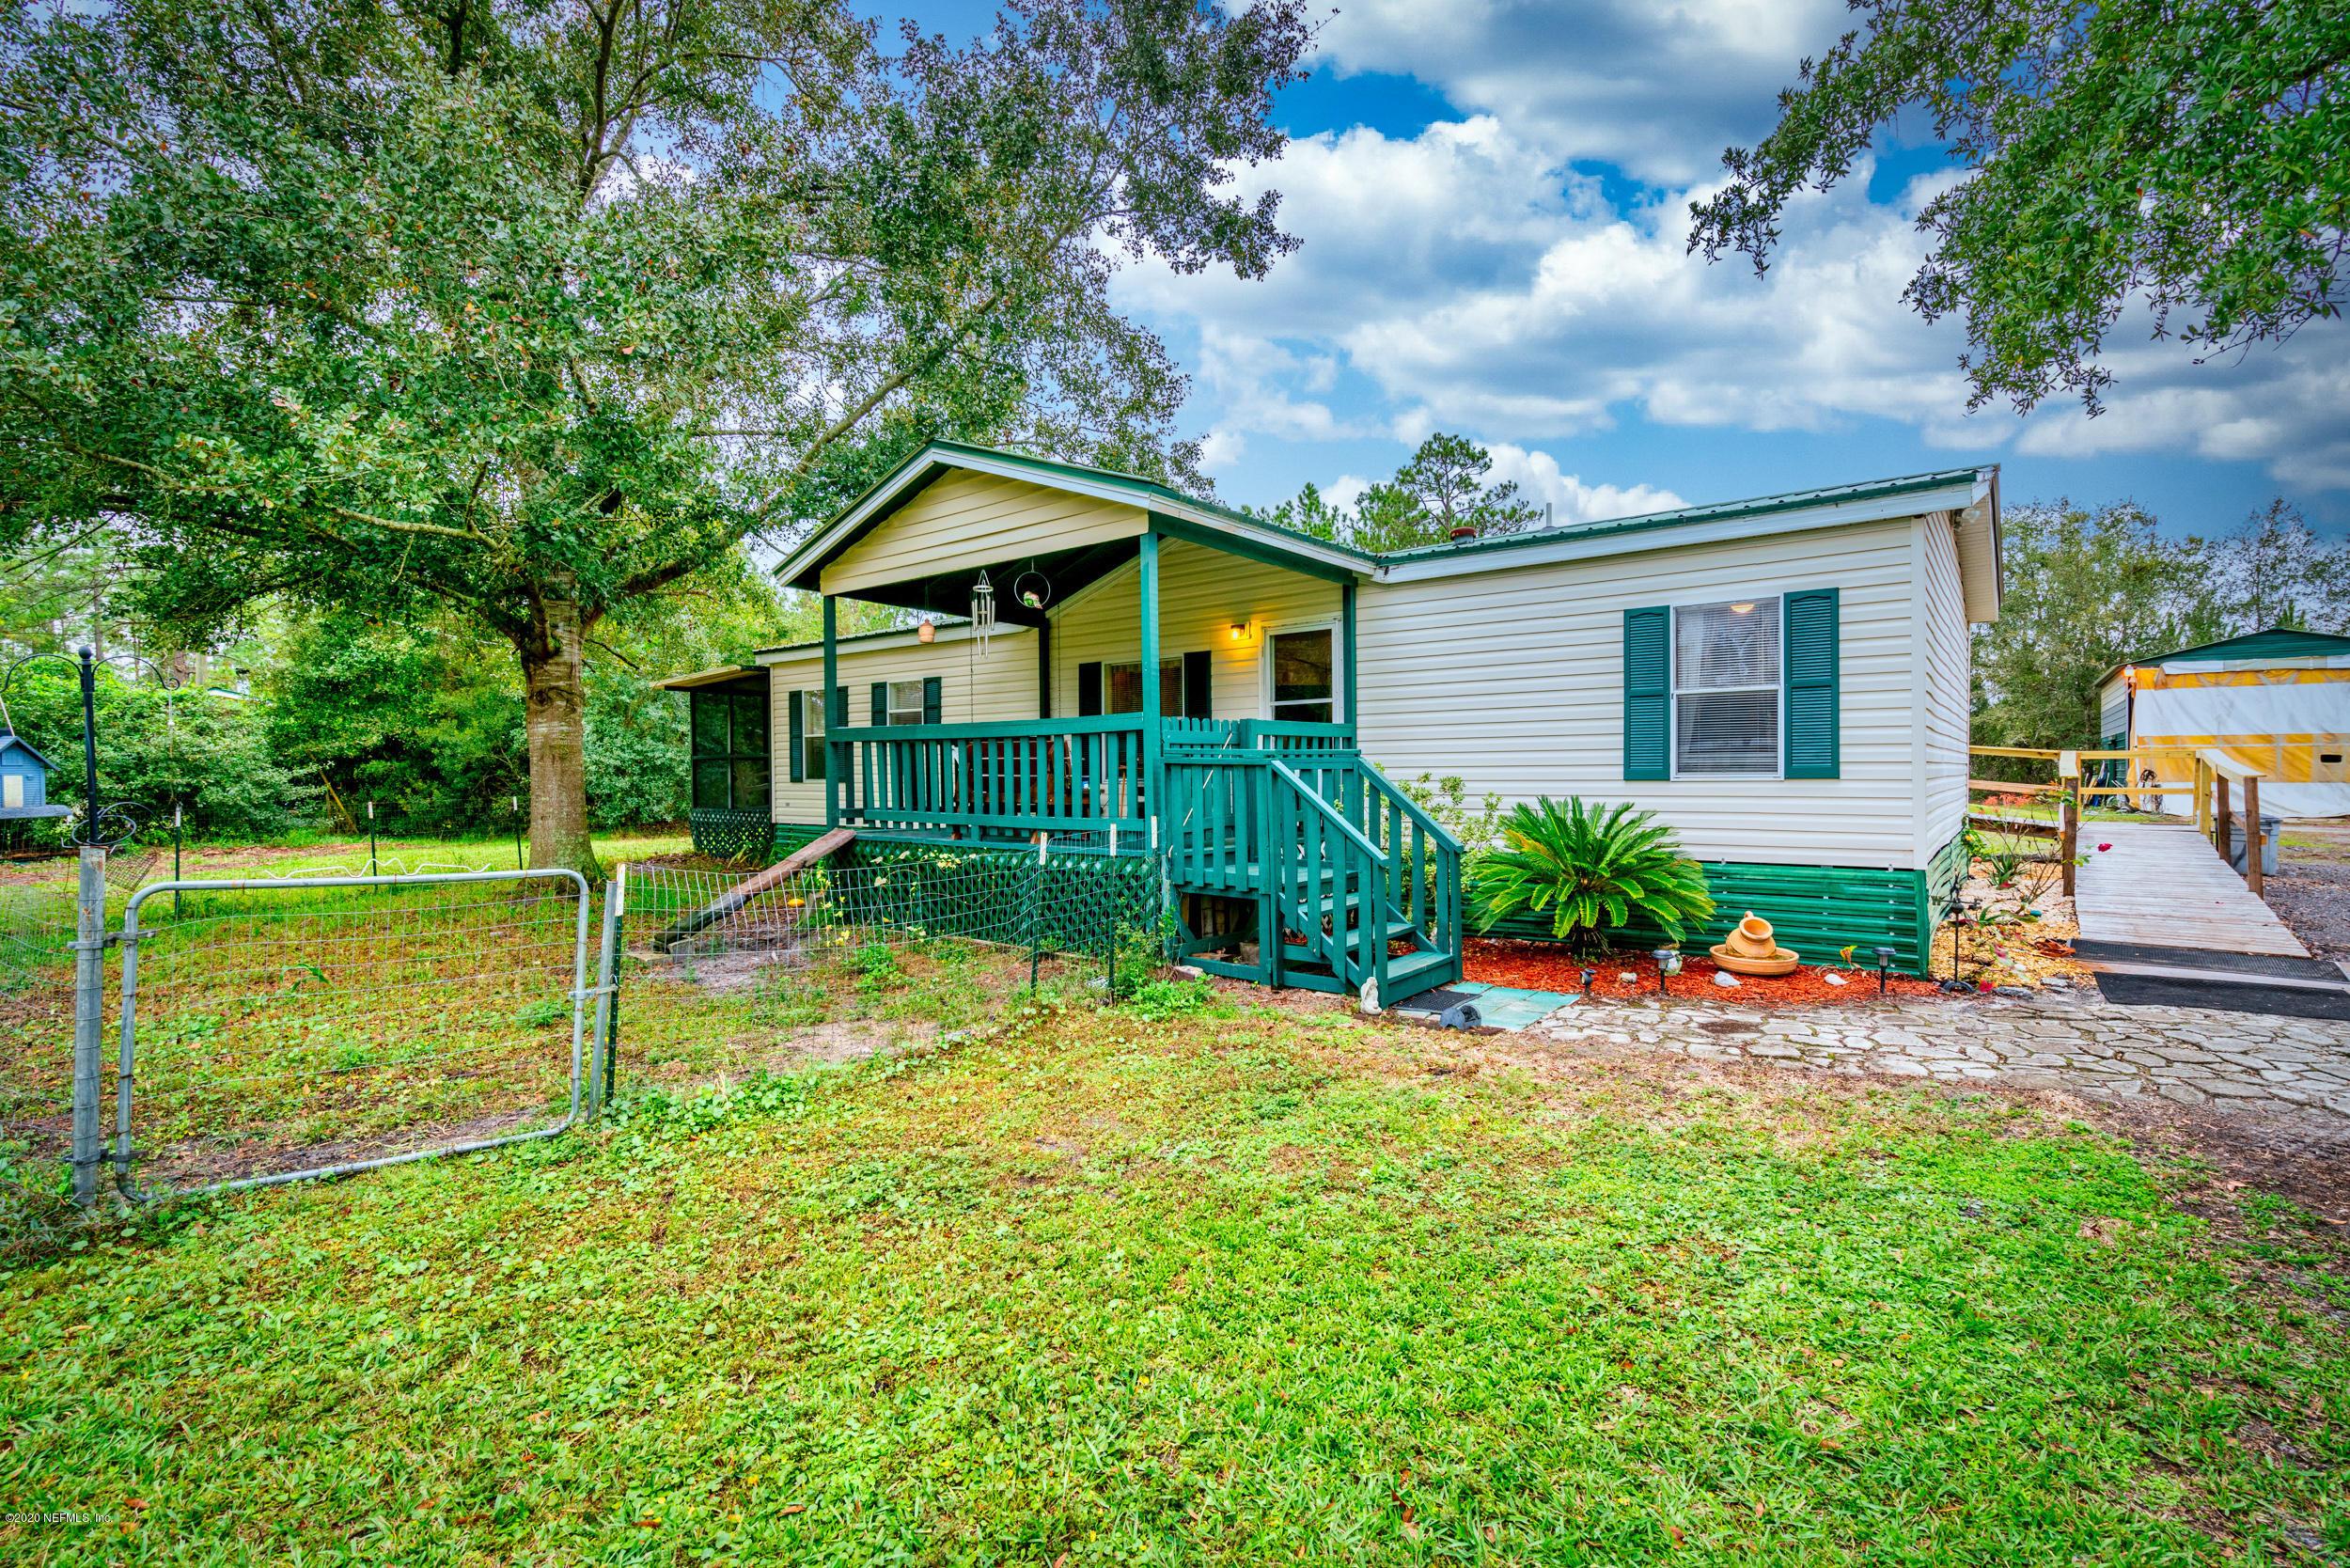 26 CORIANDER, MIDDLEBURG, FLORIDA 32068, 3 Bedrooms Bedrooms, ,2 BathroomsBathrooms,Residential,For sale,CORIANDER,1082604